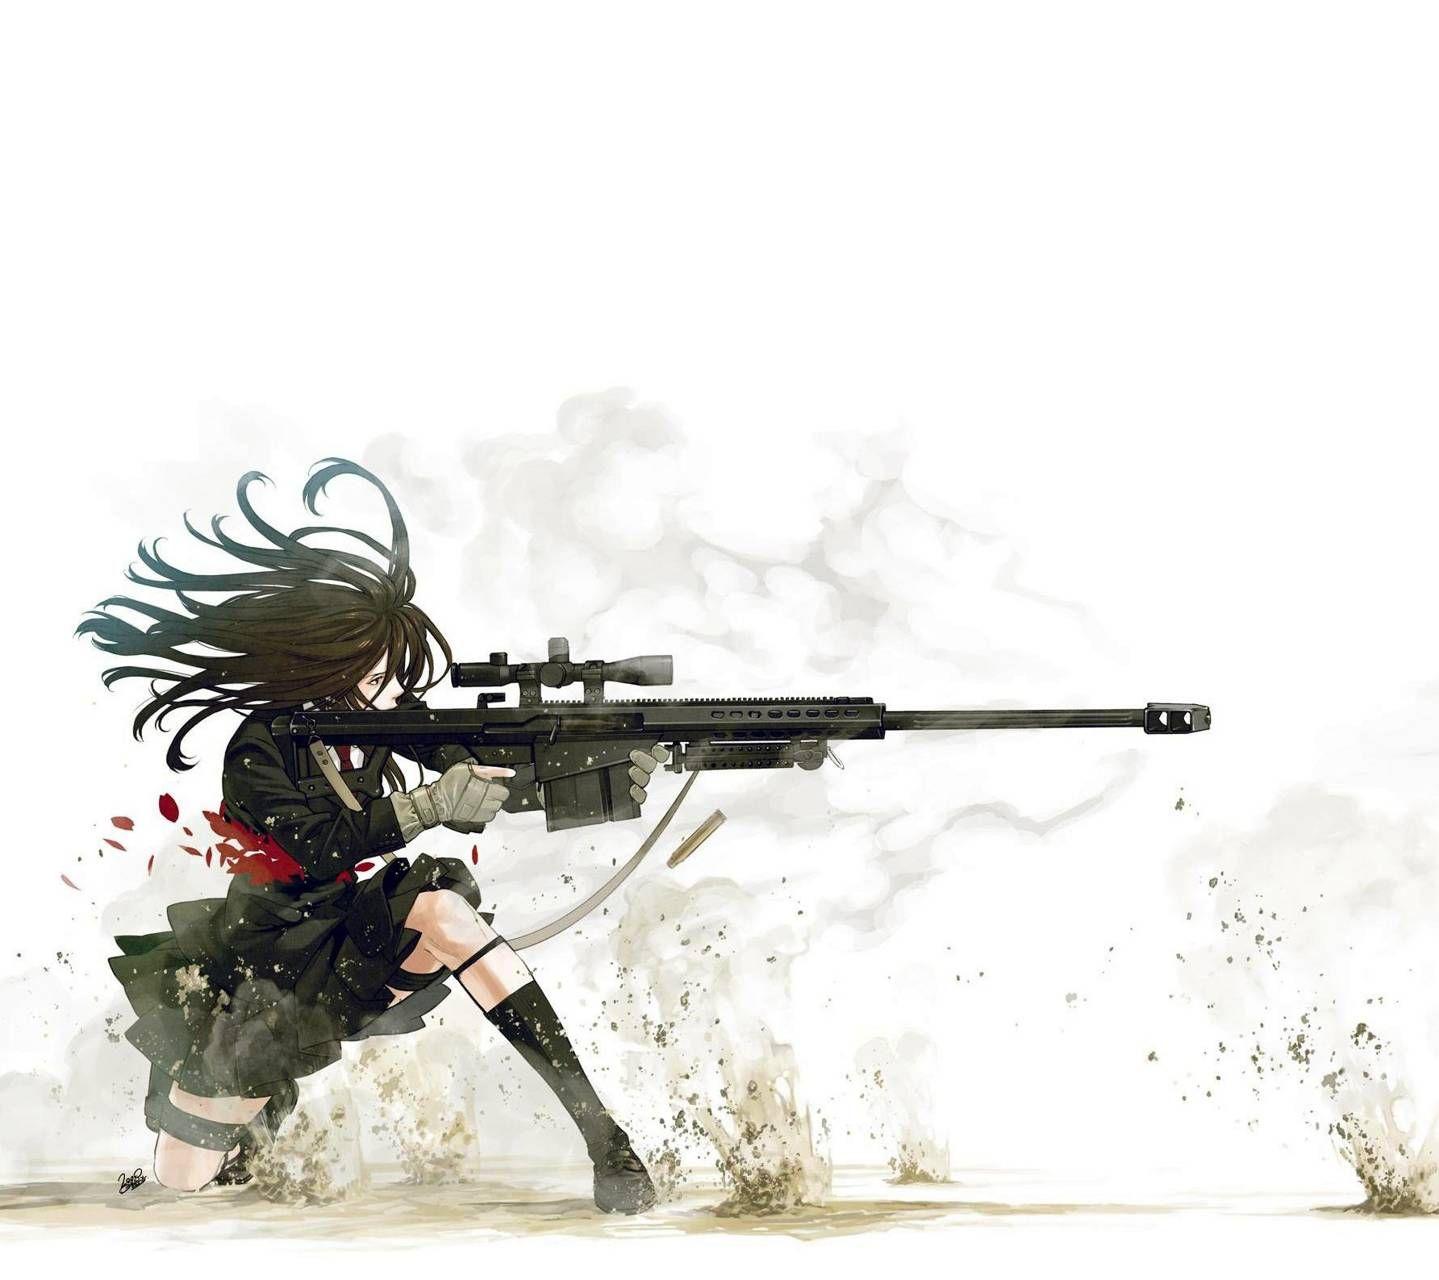 Anime Sniper Anime Wallpaper Ipad Wallpaper Hd Anime Wallpapers